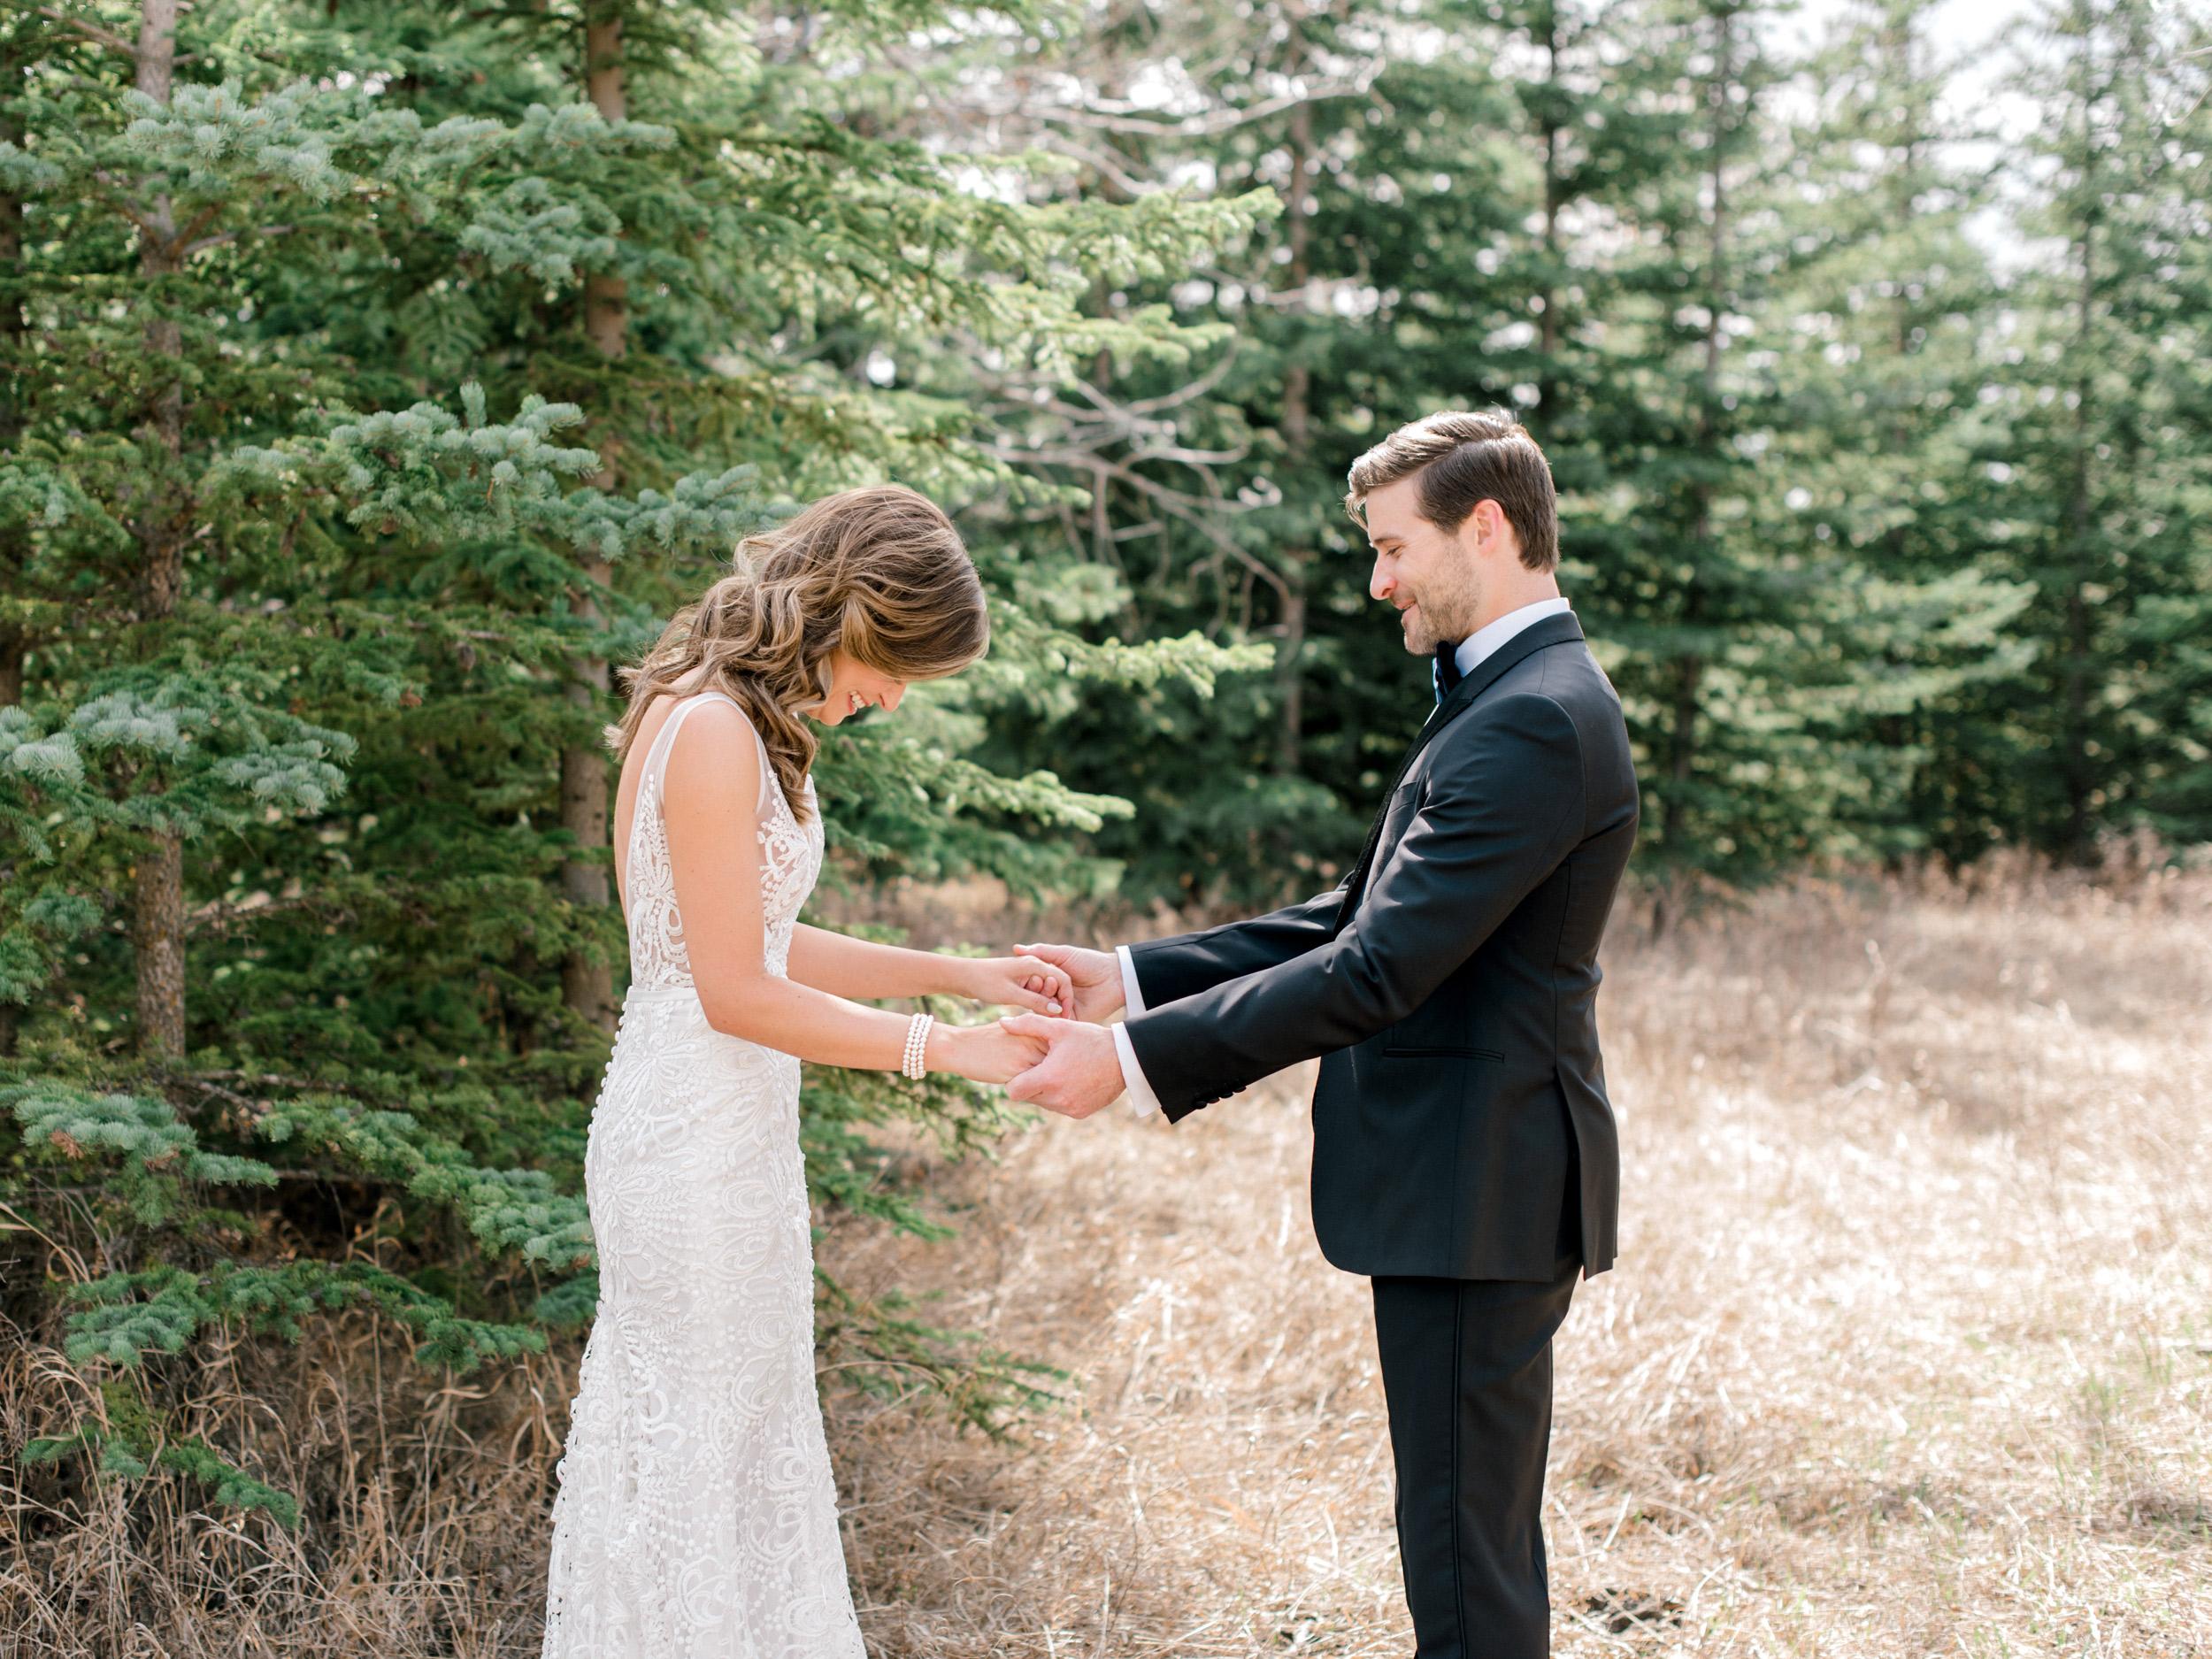 037-The_Lake_House_Calgary_Wedding.jpg